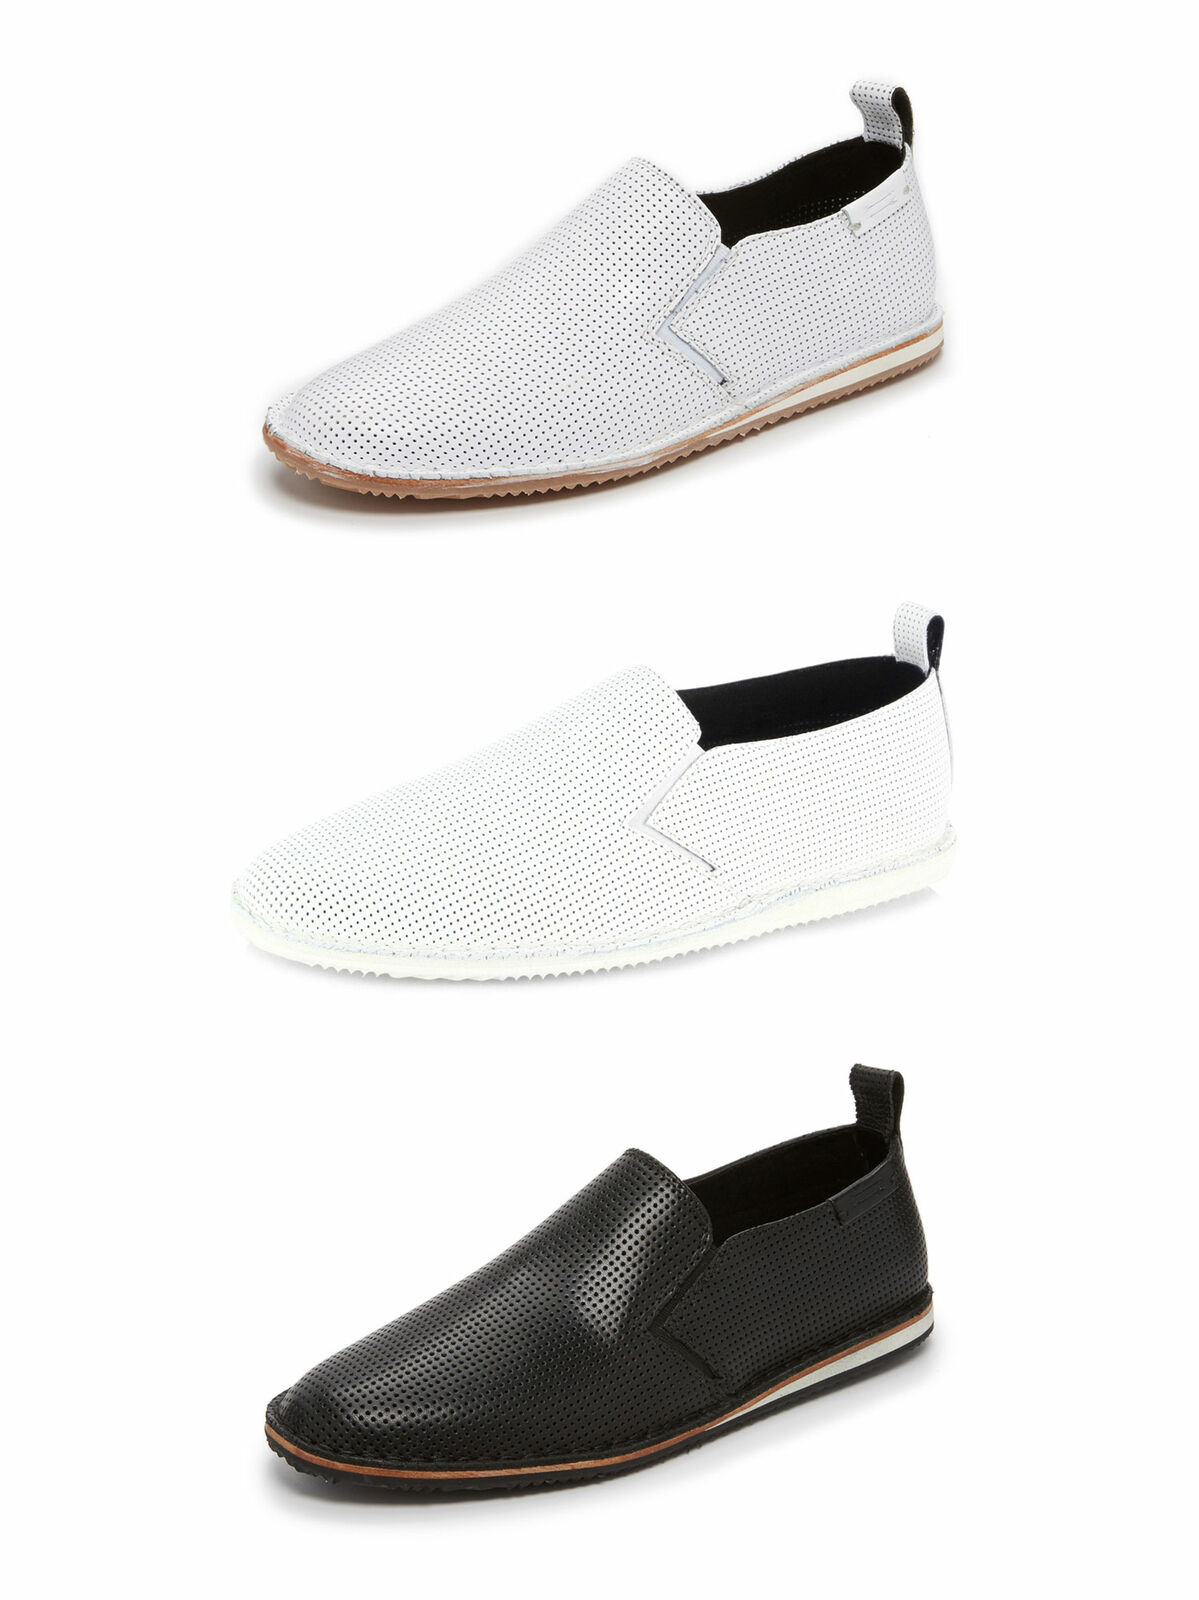 URI MINKOFF Men's Union Slip-On Sneakers  150 NIB